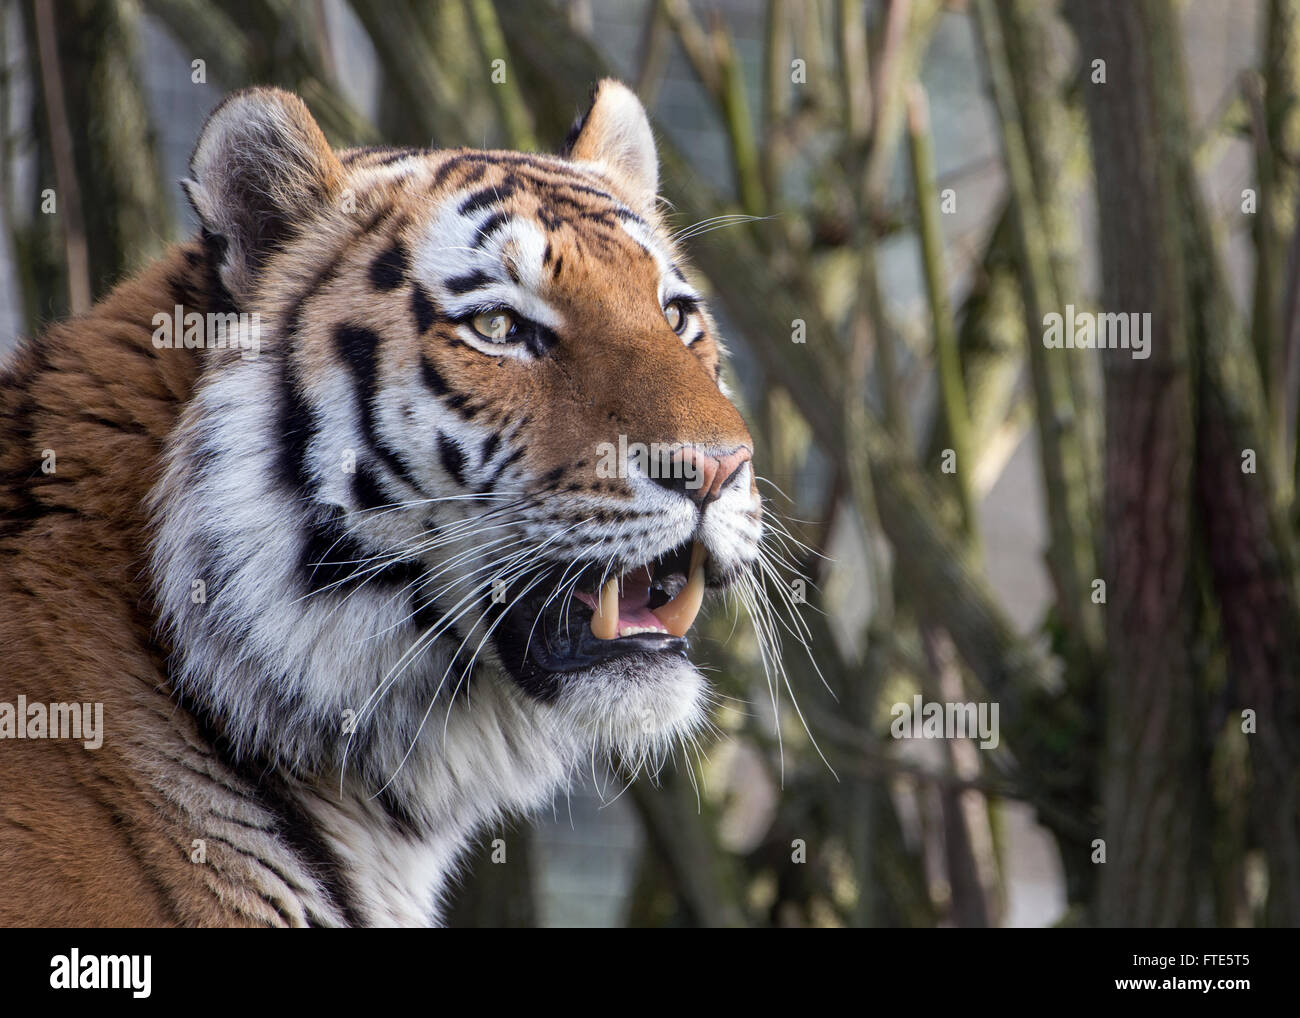 Maschio (Amur Siberian) tiger Immagini Stock